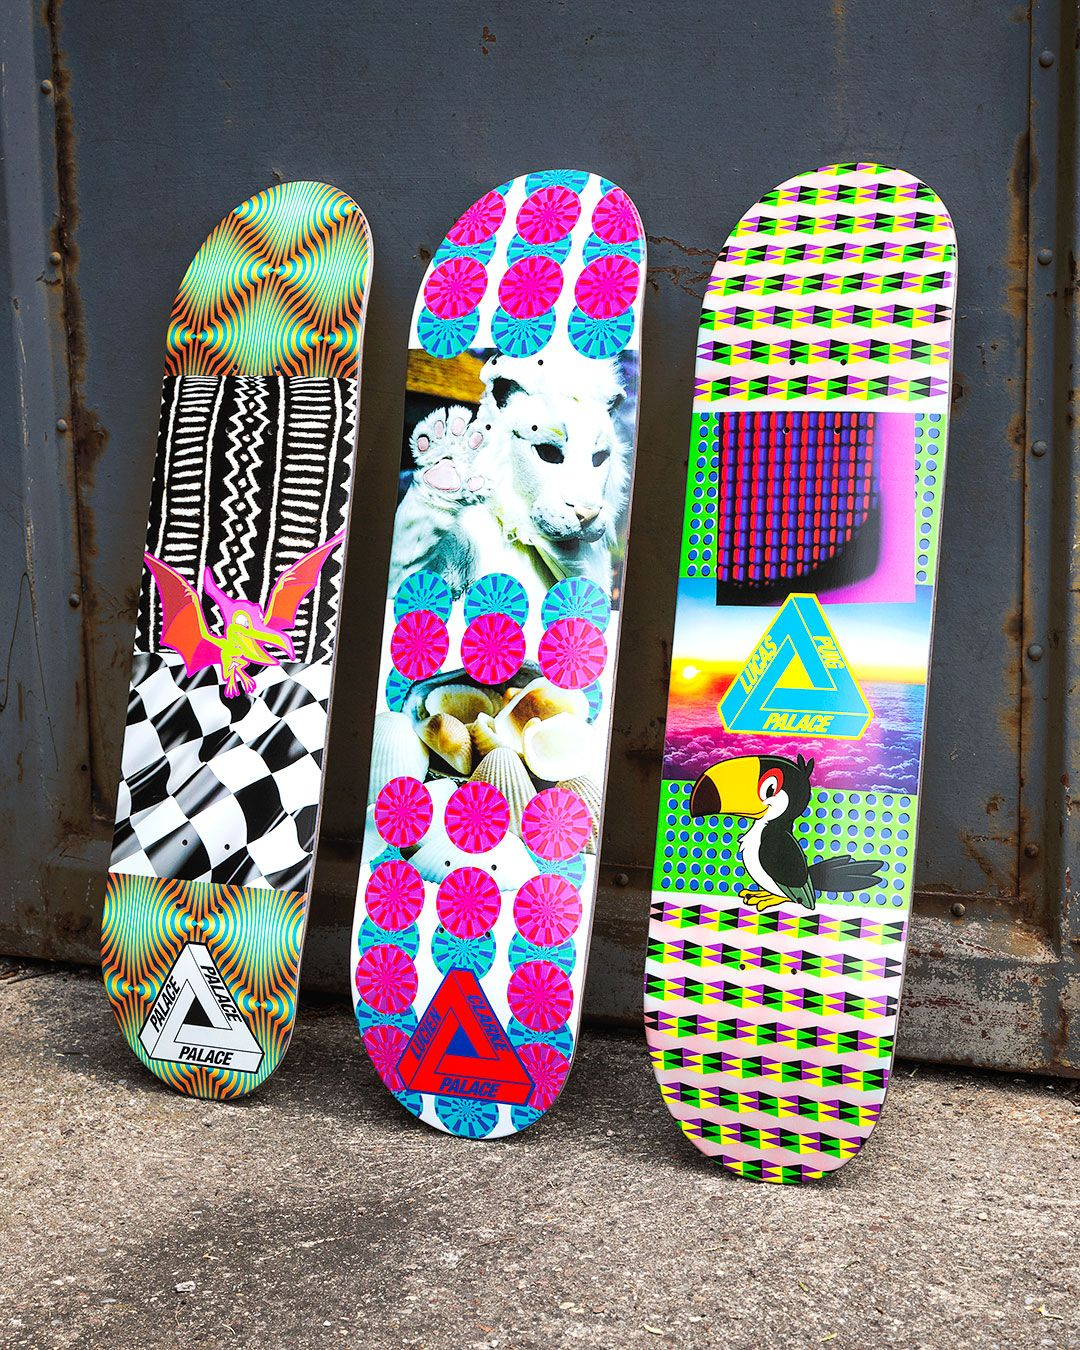 Palace Summer 19 Skateboard Deck Art Palace Skateboards Skateboard Shop